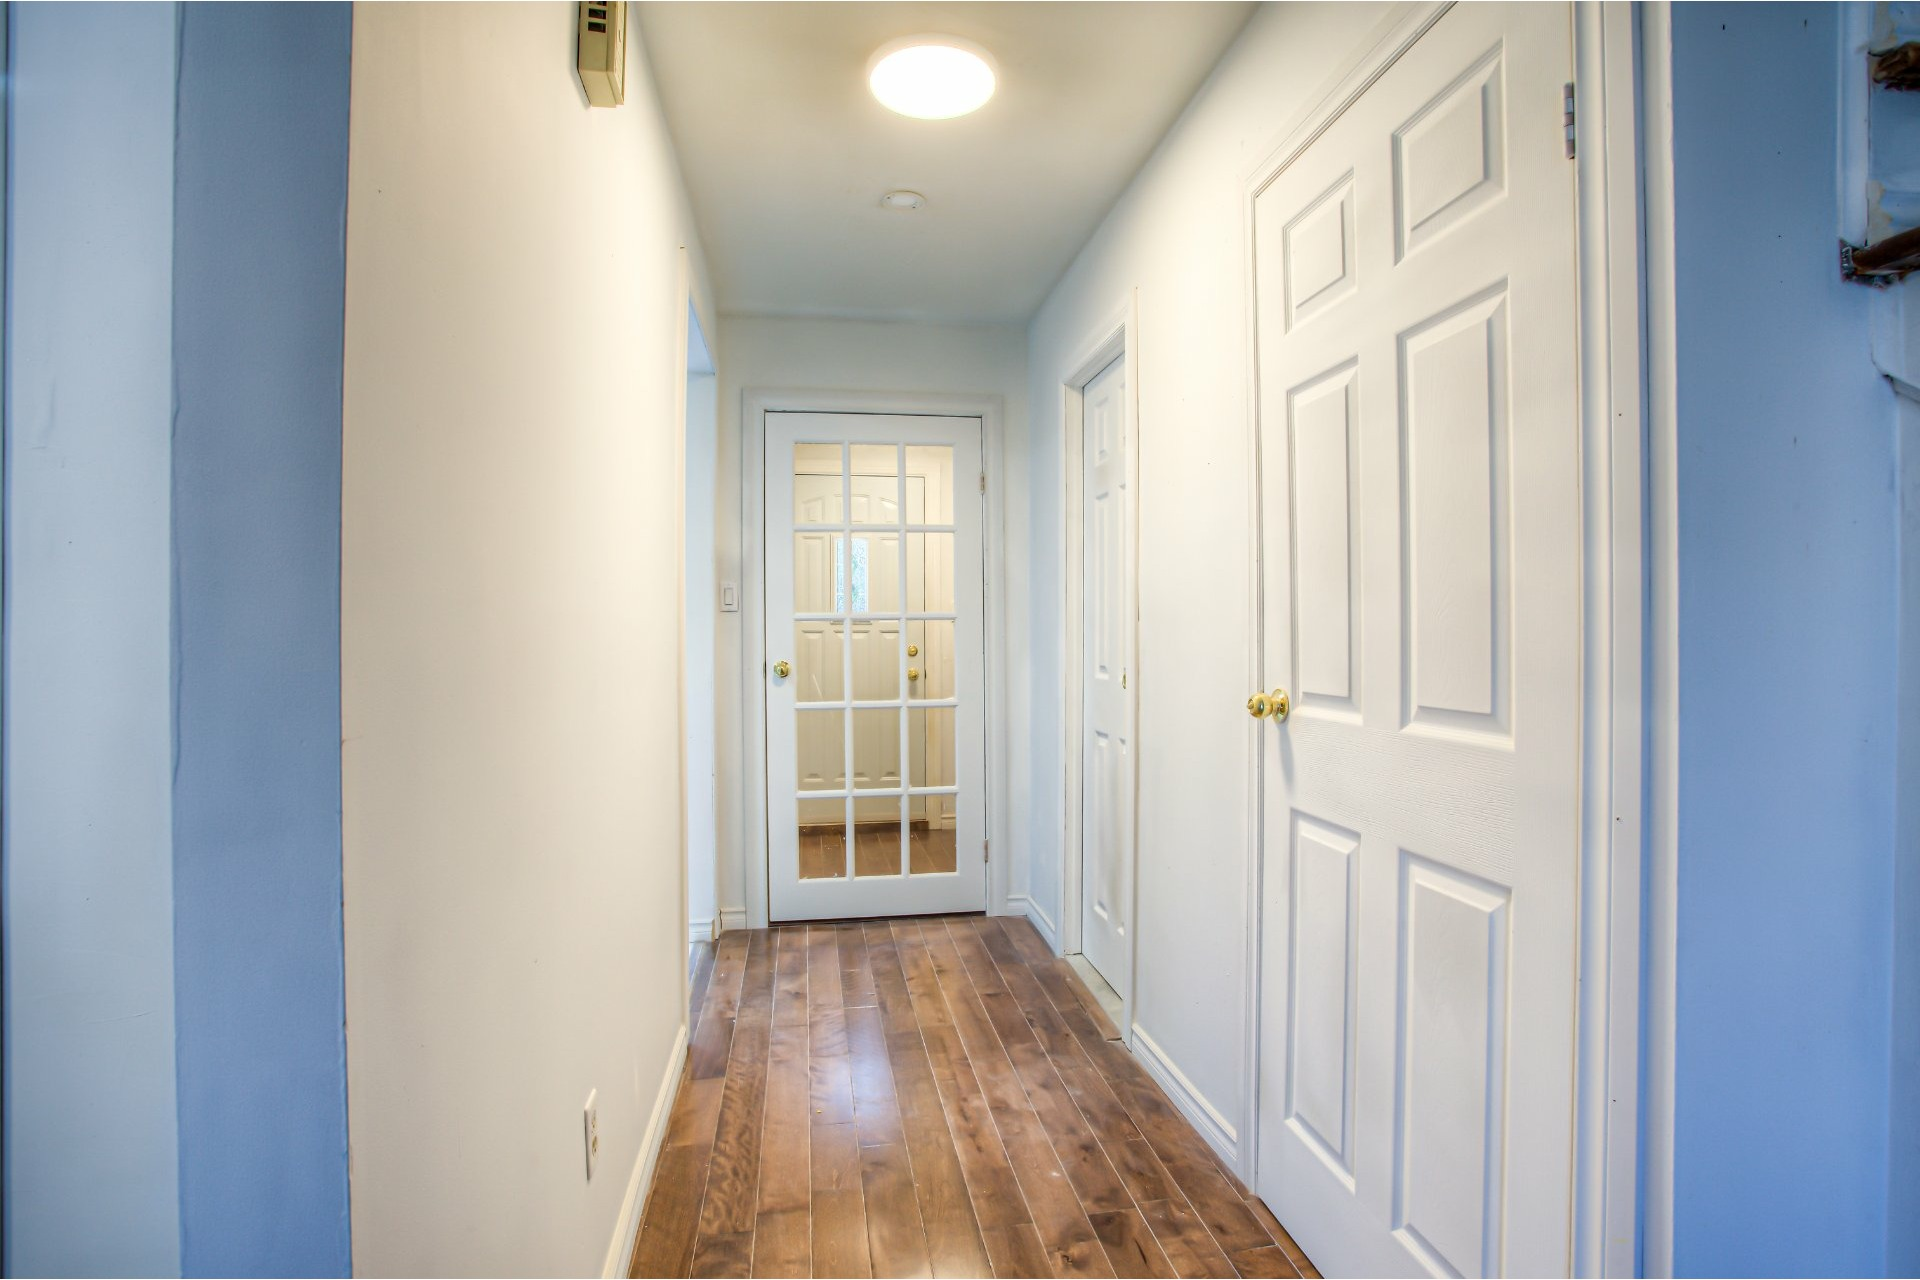 image 3 - MX - Casa sola - MX En venta Dollard-Des Ormeaux - 7 habitaciones